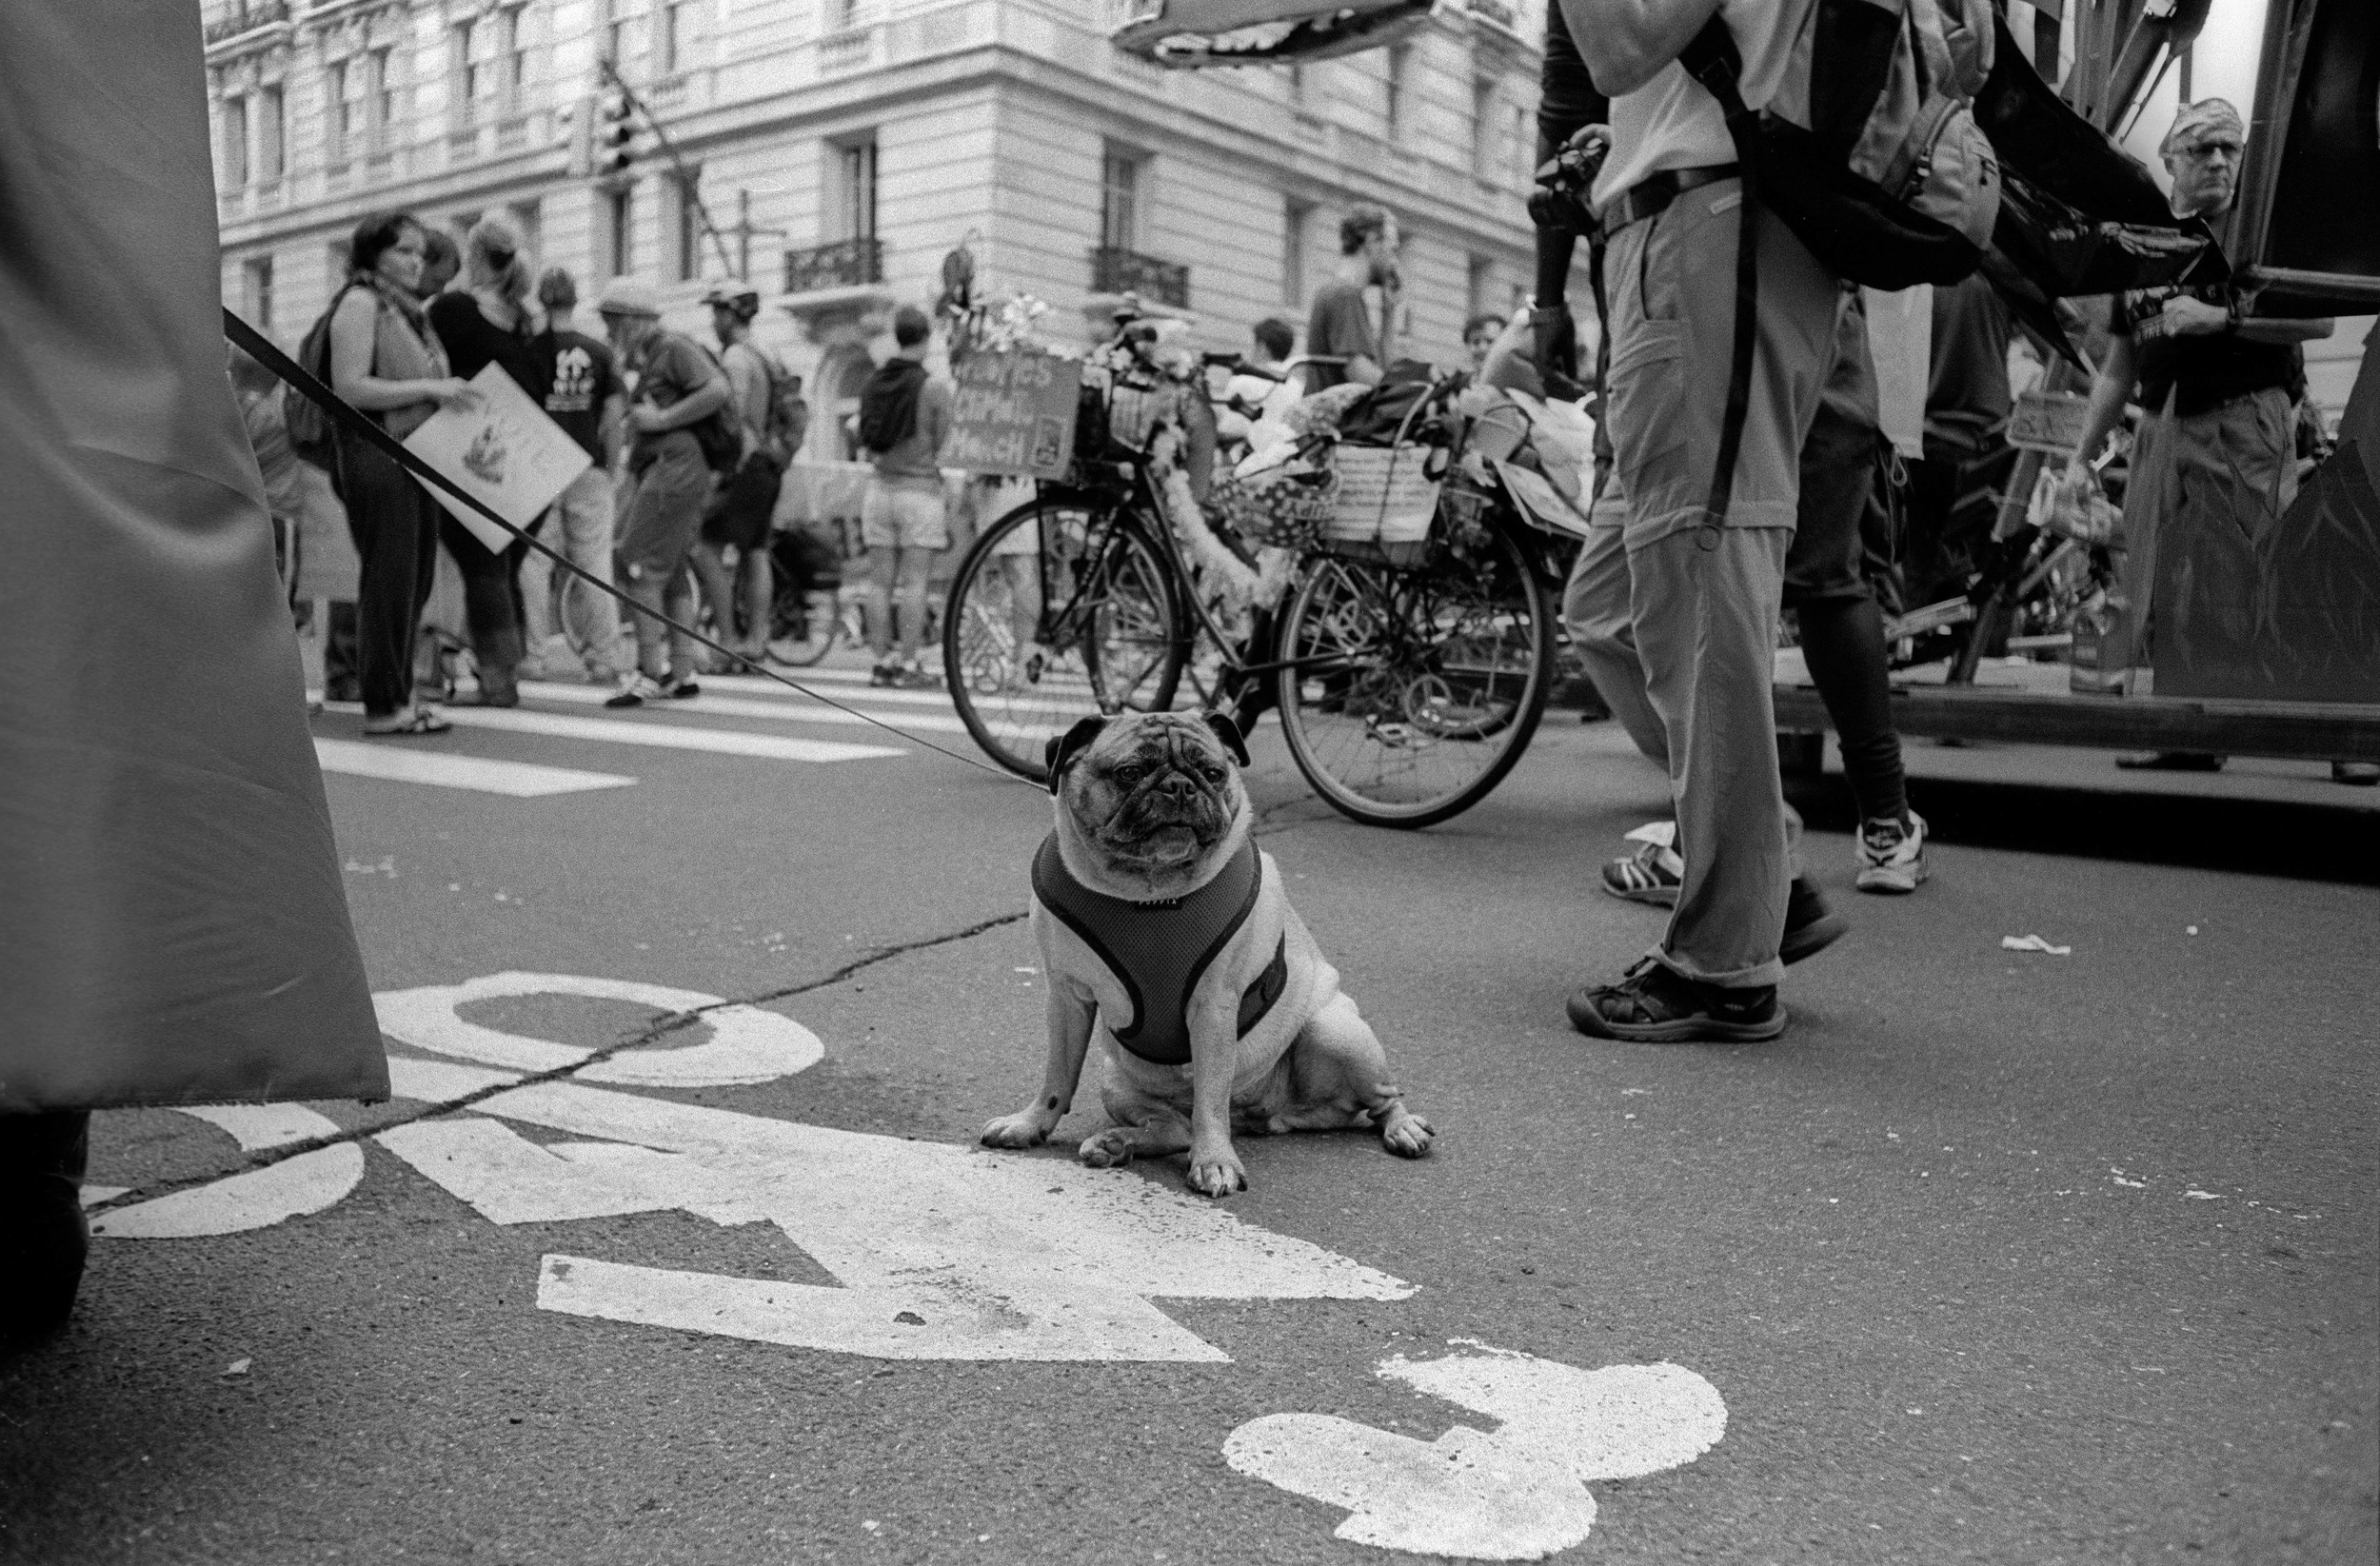 Defiance, NYC - 2015